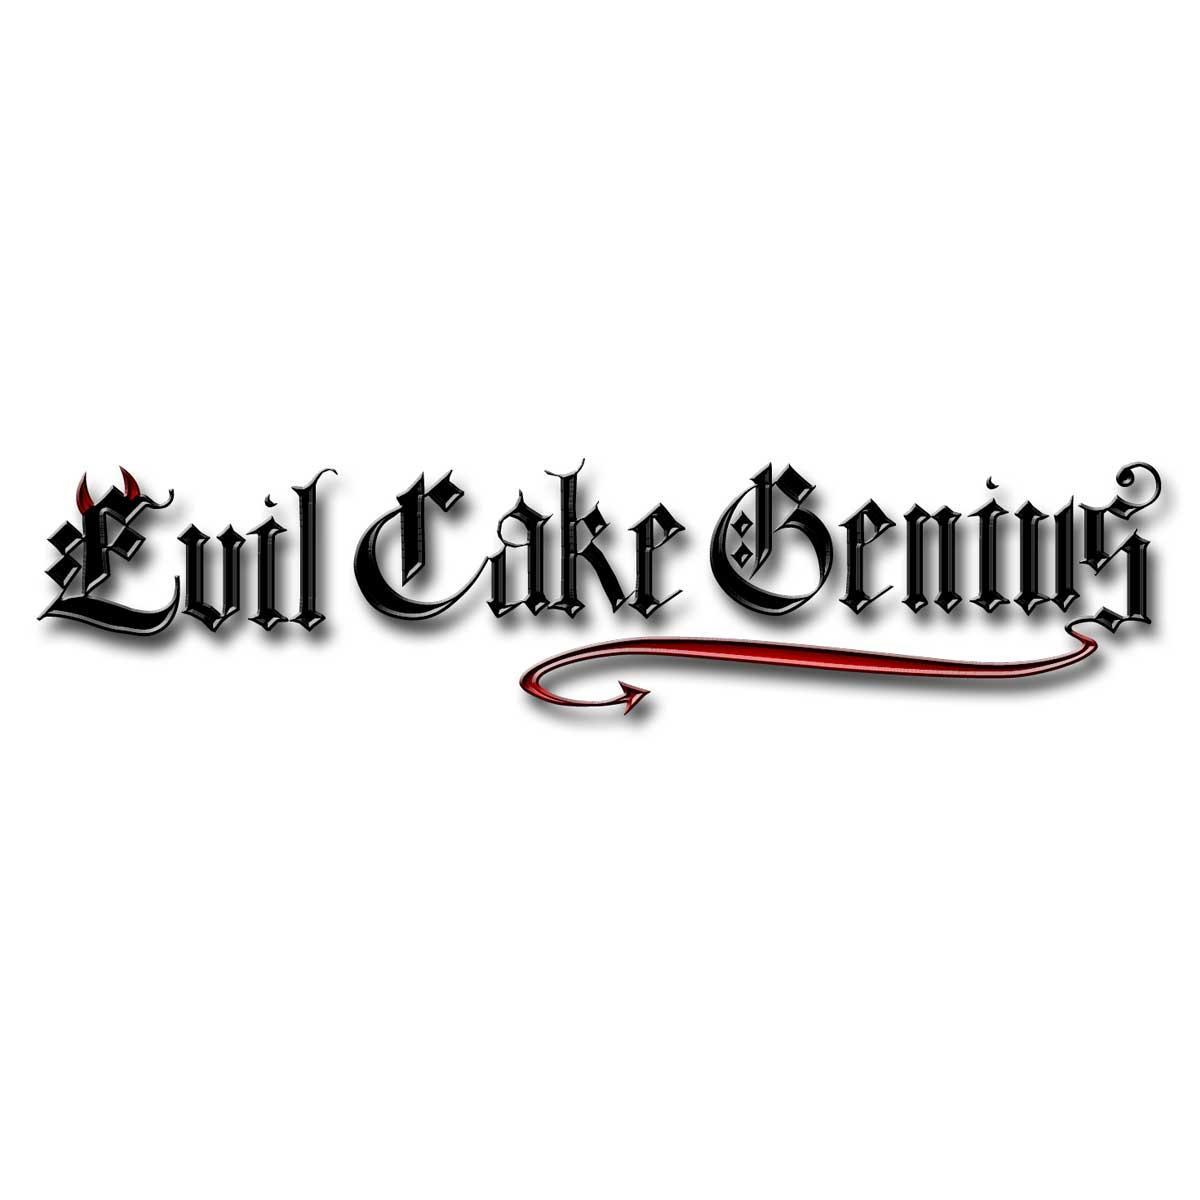 Sugar Skull Seamless Pattern Mesh Stencil Evil Cake Genius